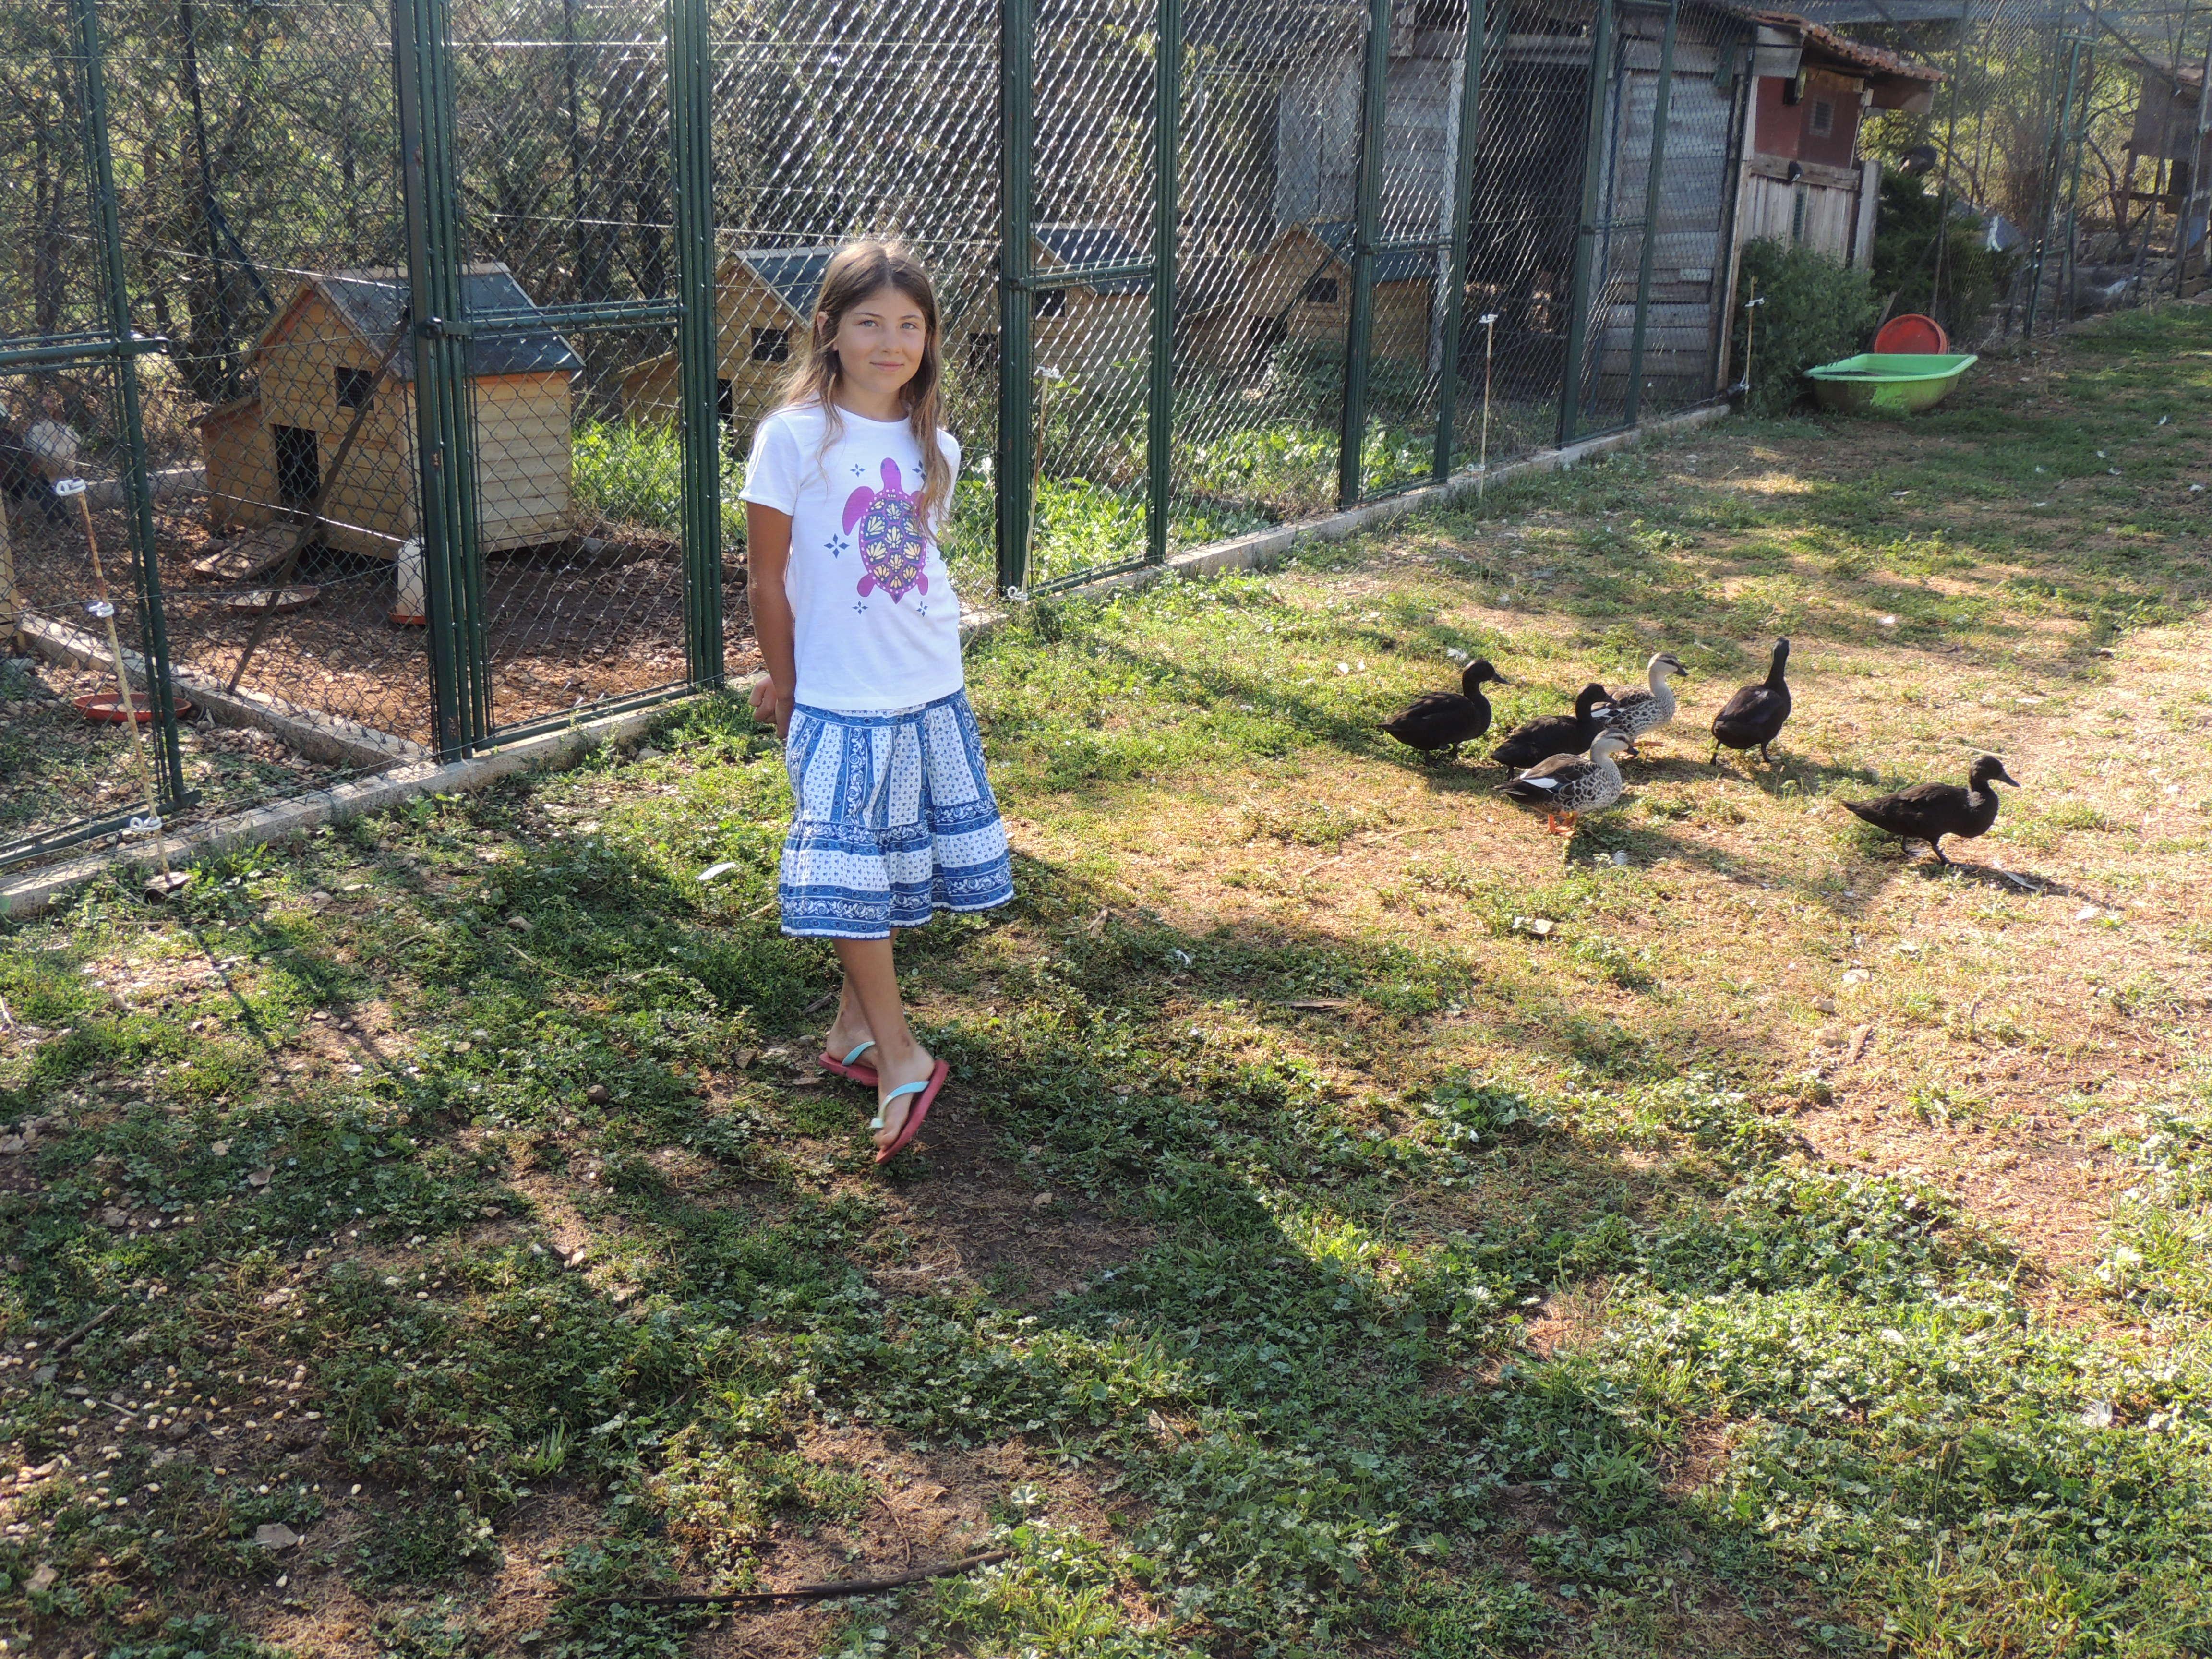 LF – Micaela and ducks